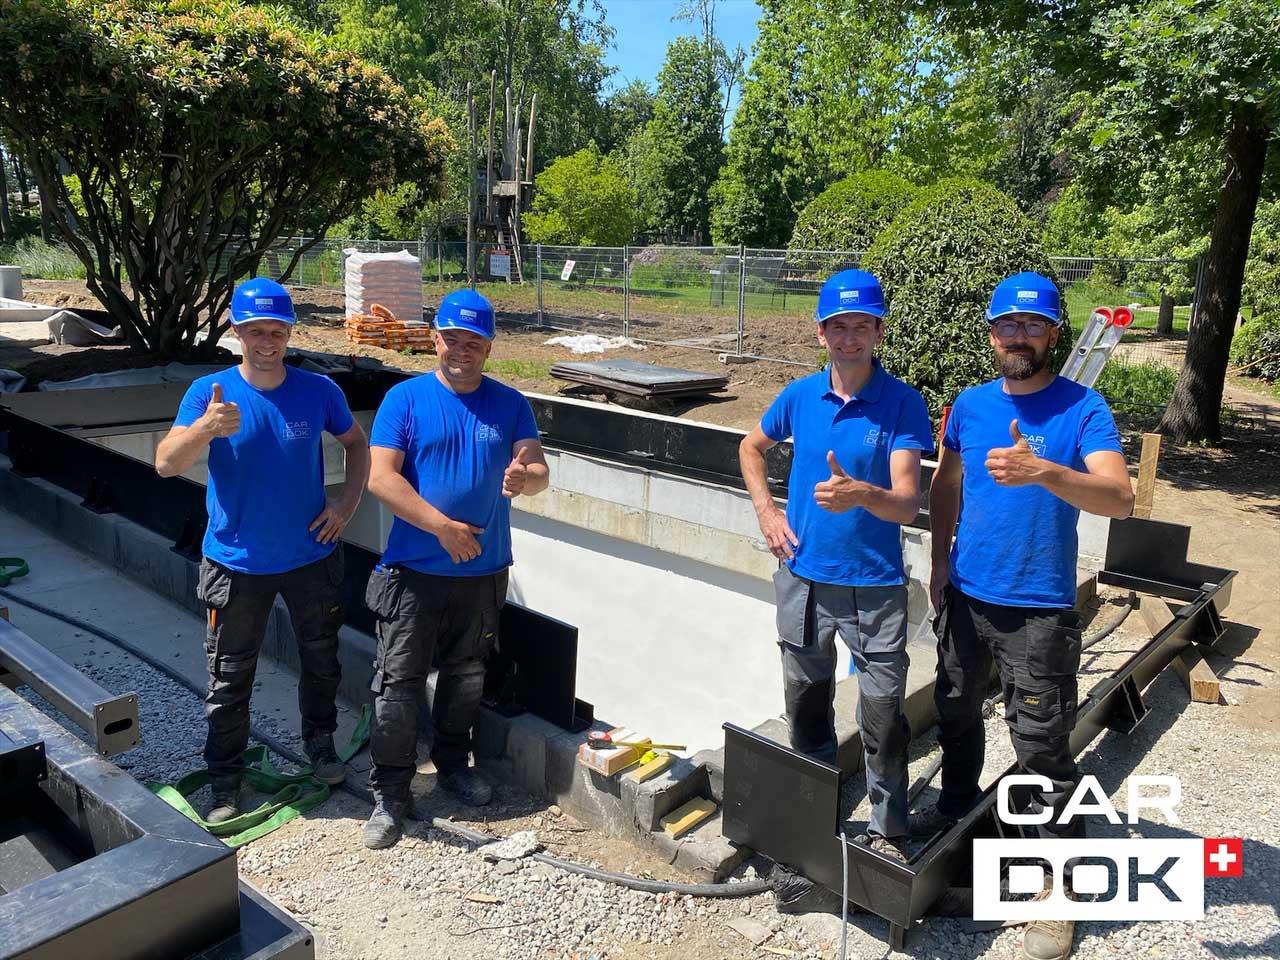 cardok benelux team